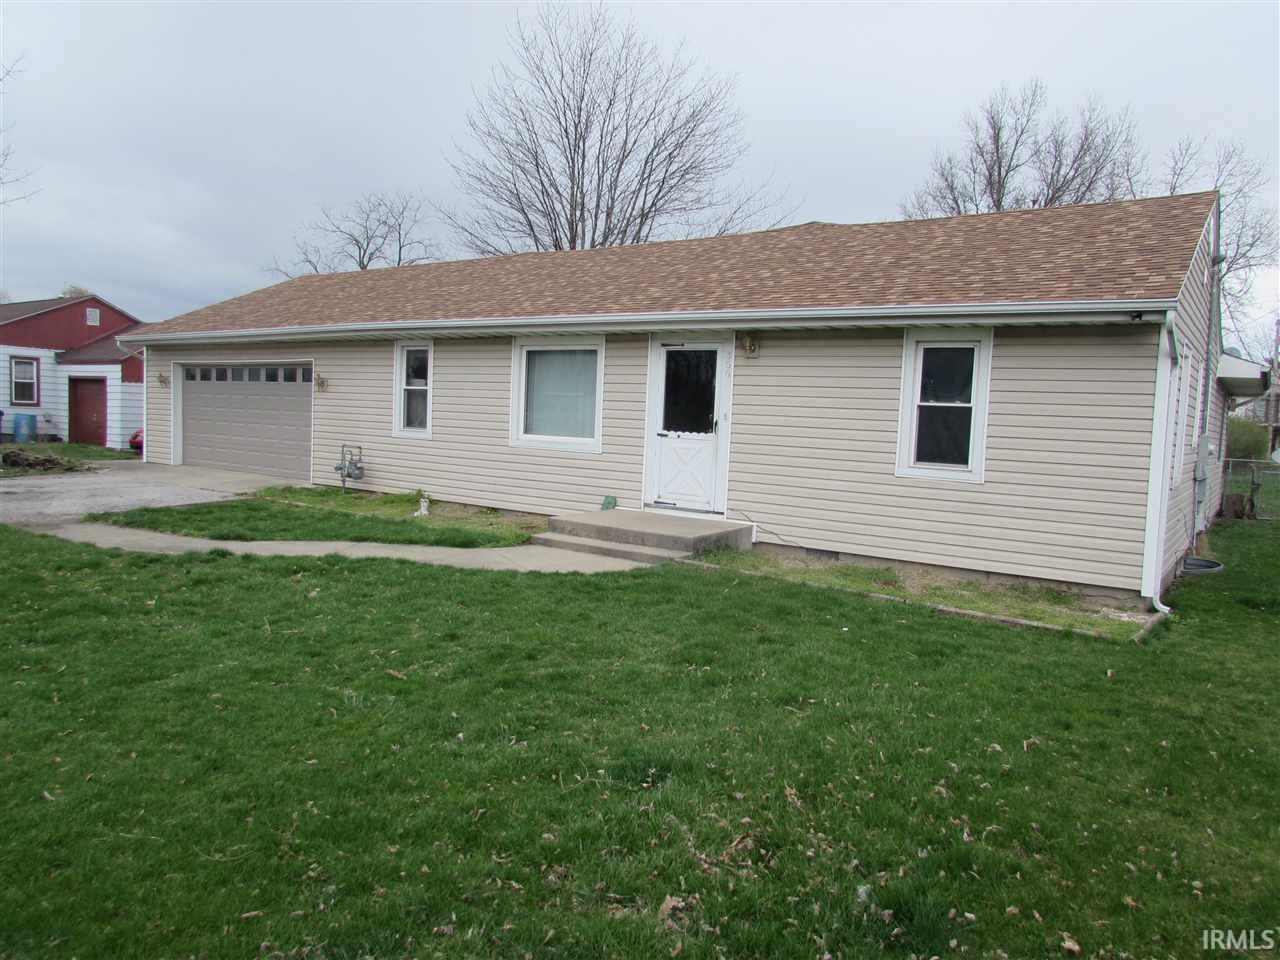 300 W Michigan, Remington, IN 47977